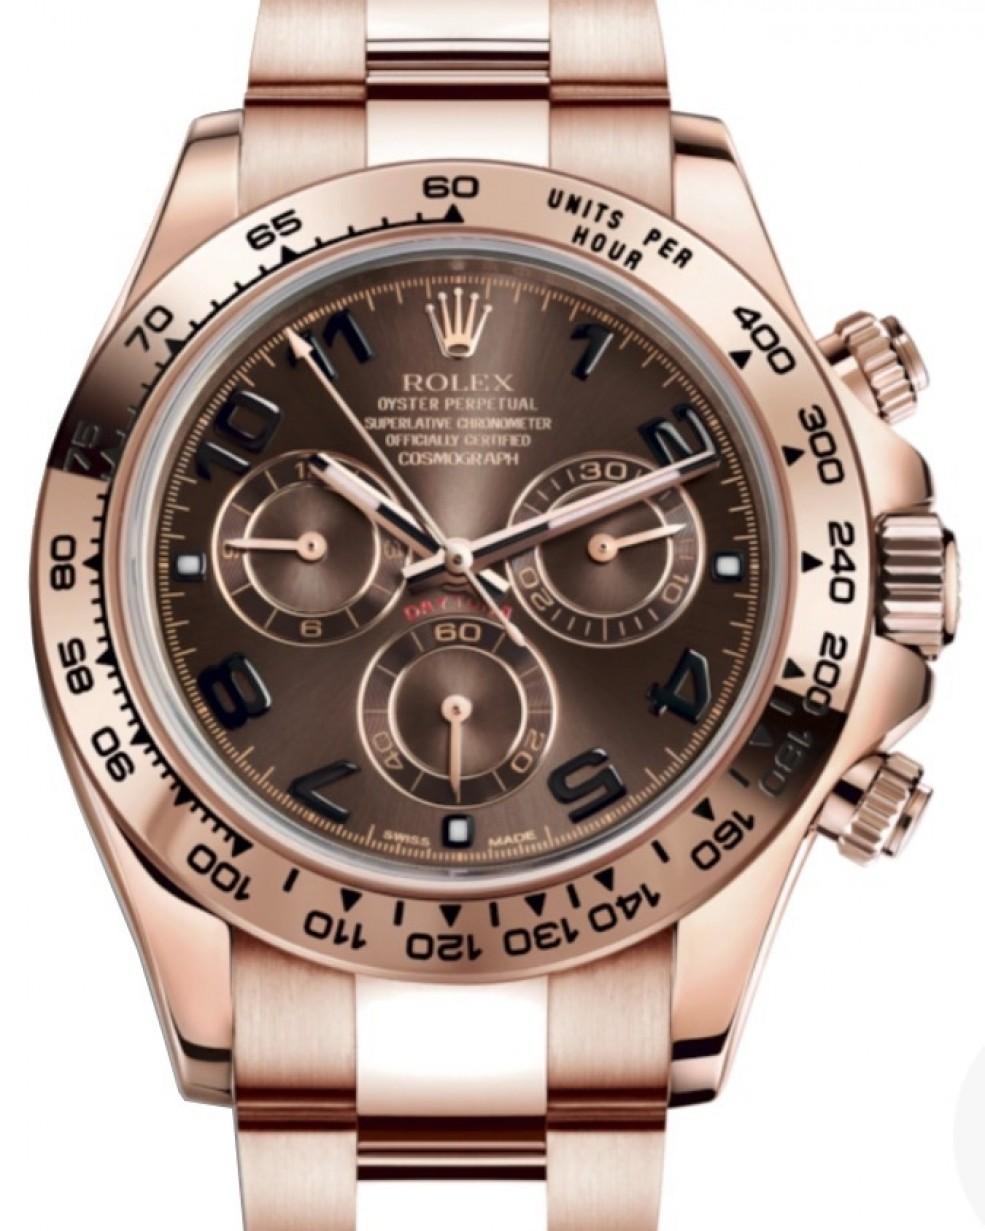 Rolex Daytona 116505 Chocolate Rose Gold Chronograph BRAND NEW